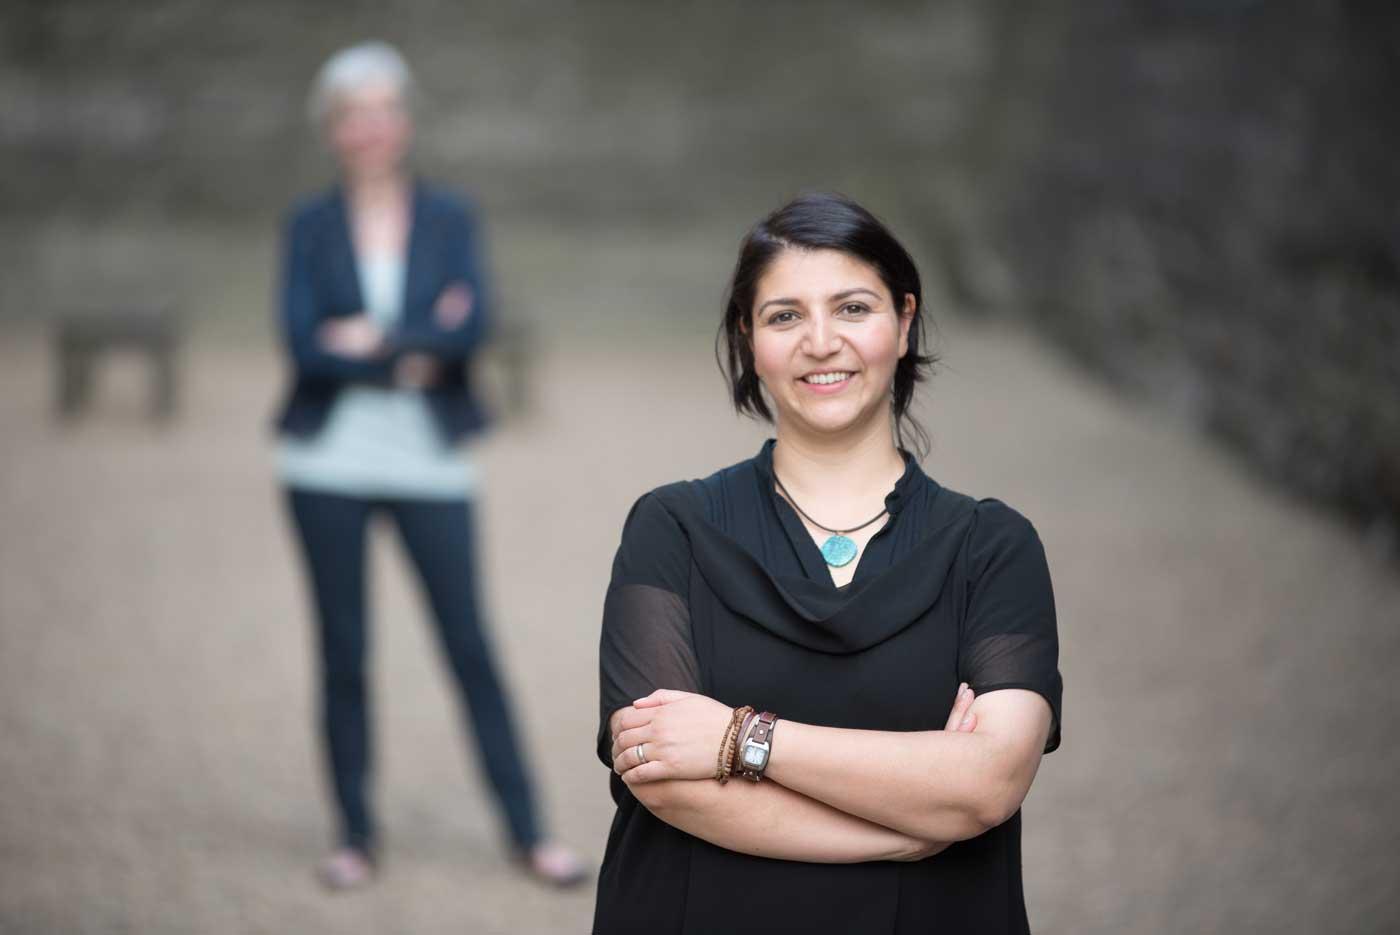 Gisela Bhatti | Fundraising und System